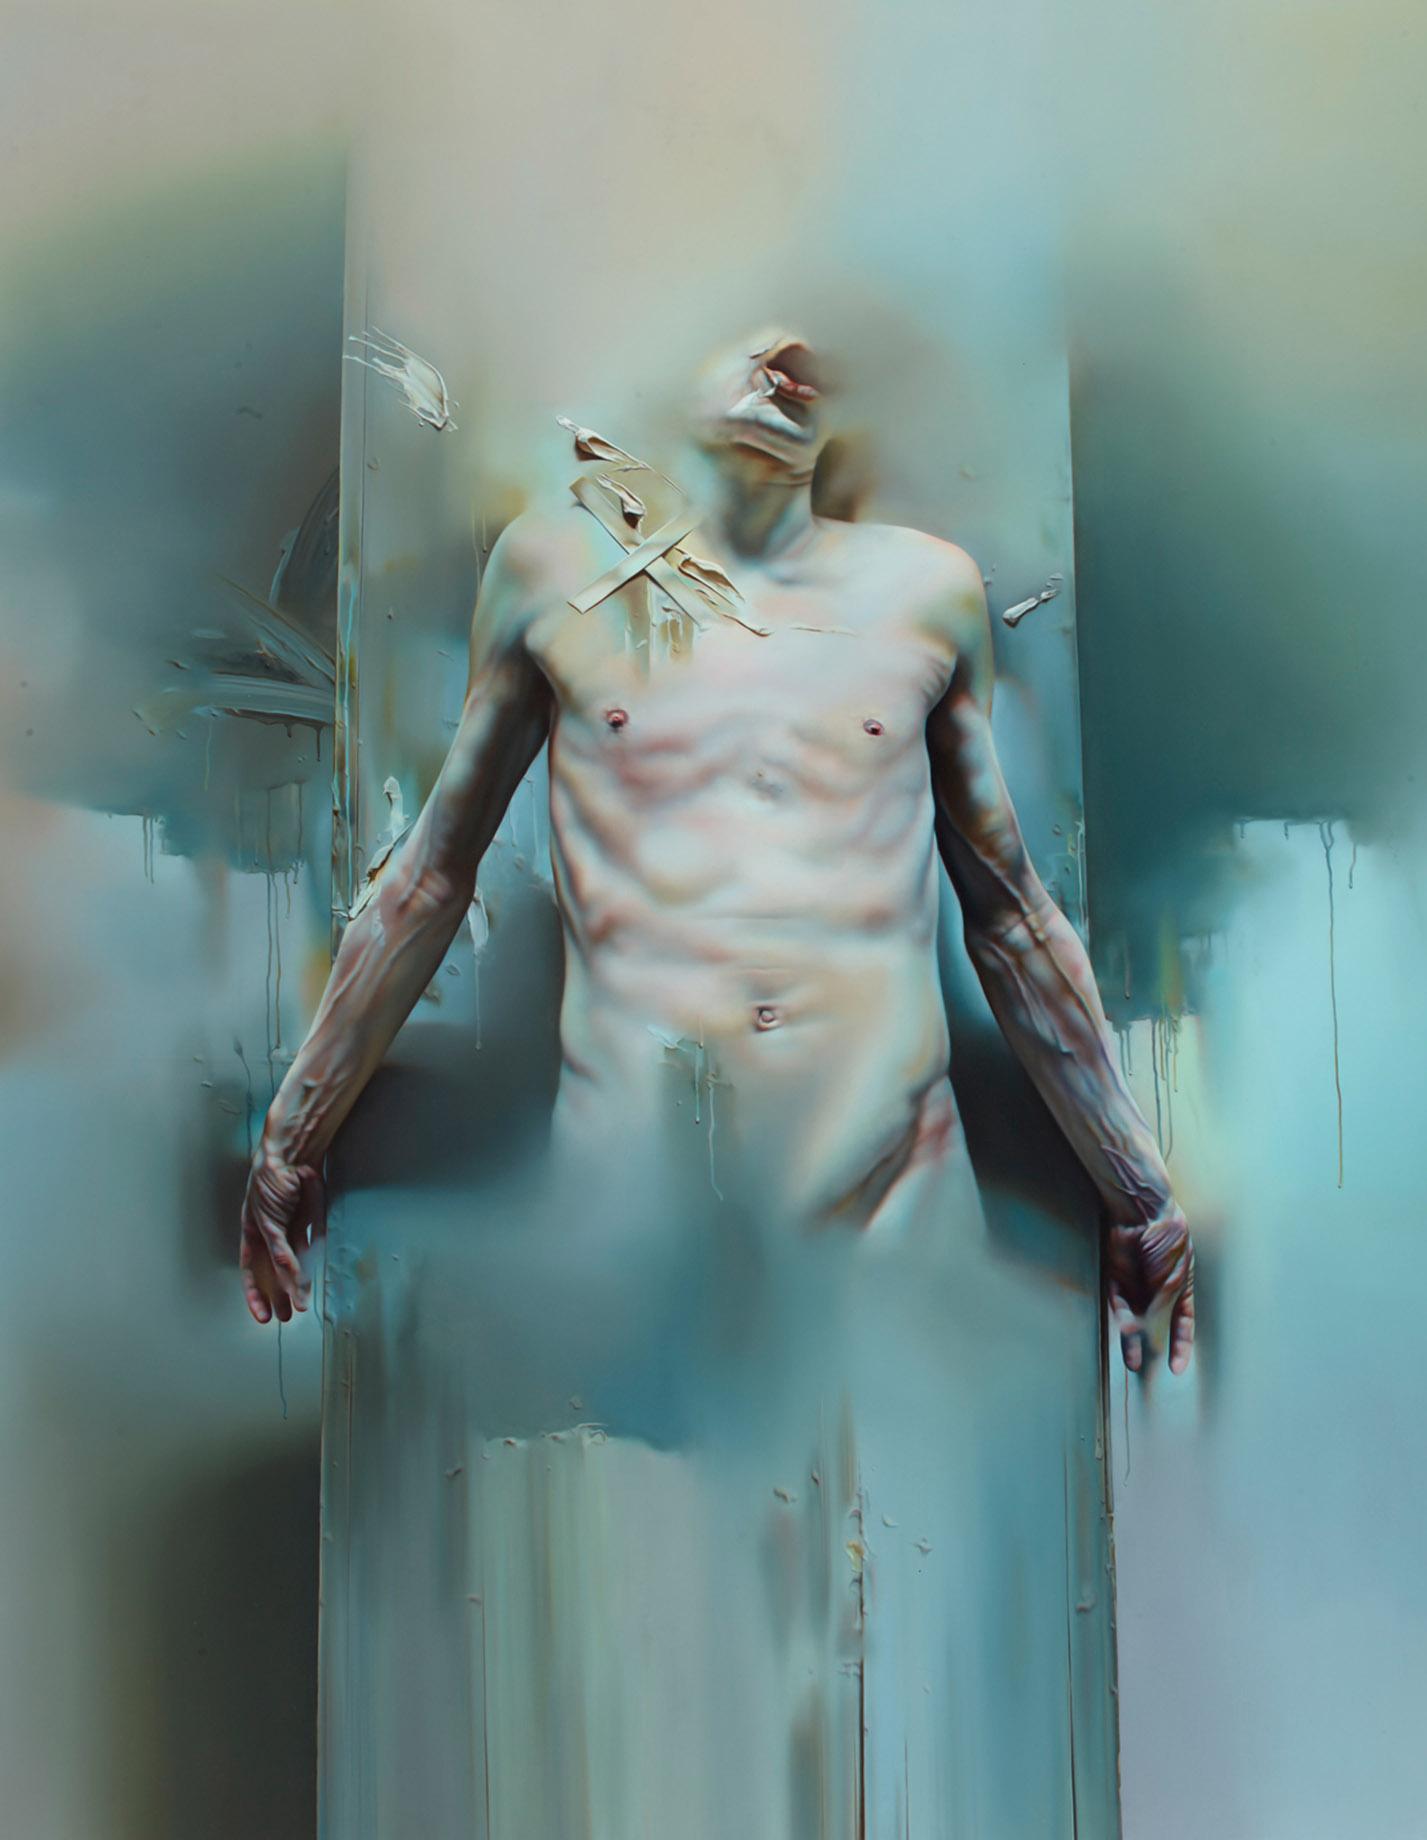 работы художника Иштвана Шандорфи / Istvan Sandorfi paintings